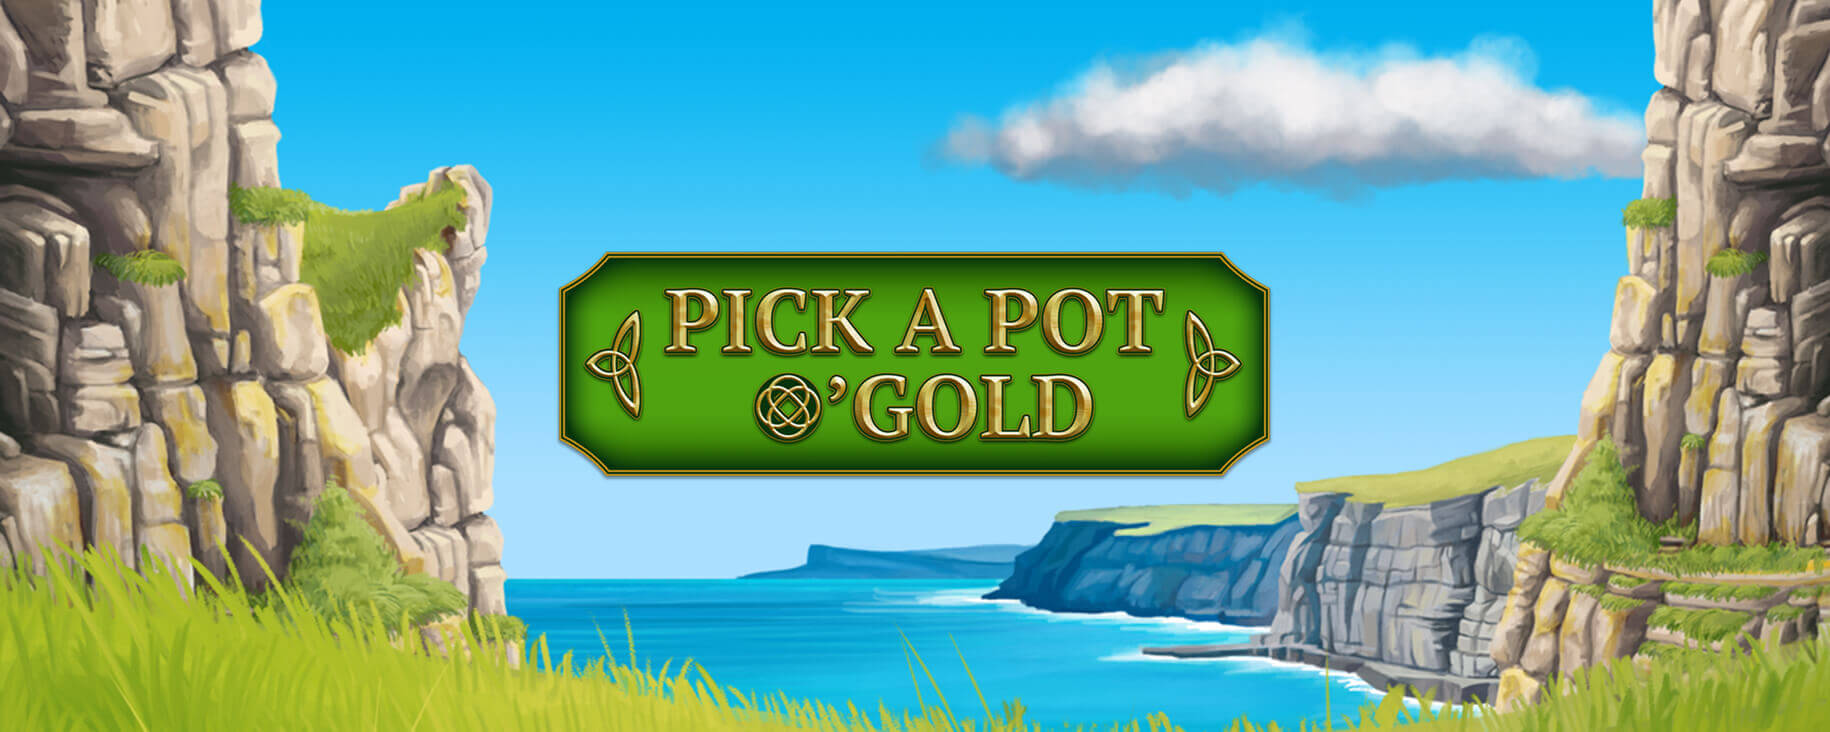 NEW GAME ALERT: Pick a Pot O' Gold